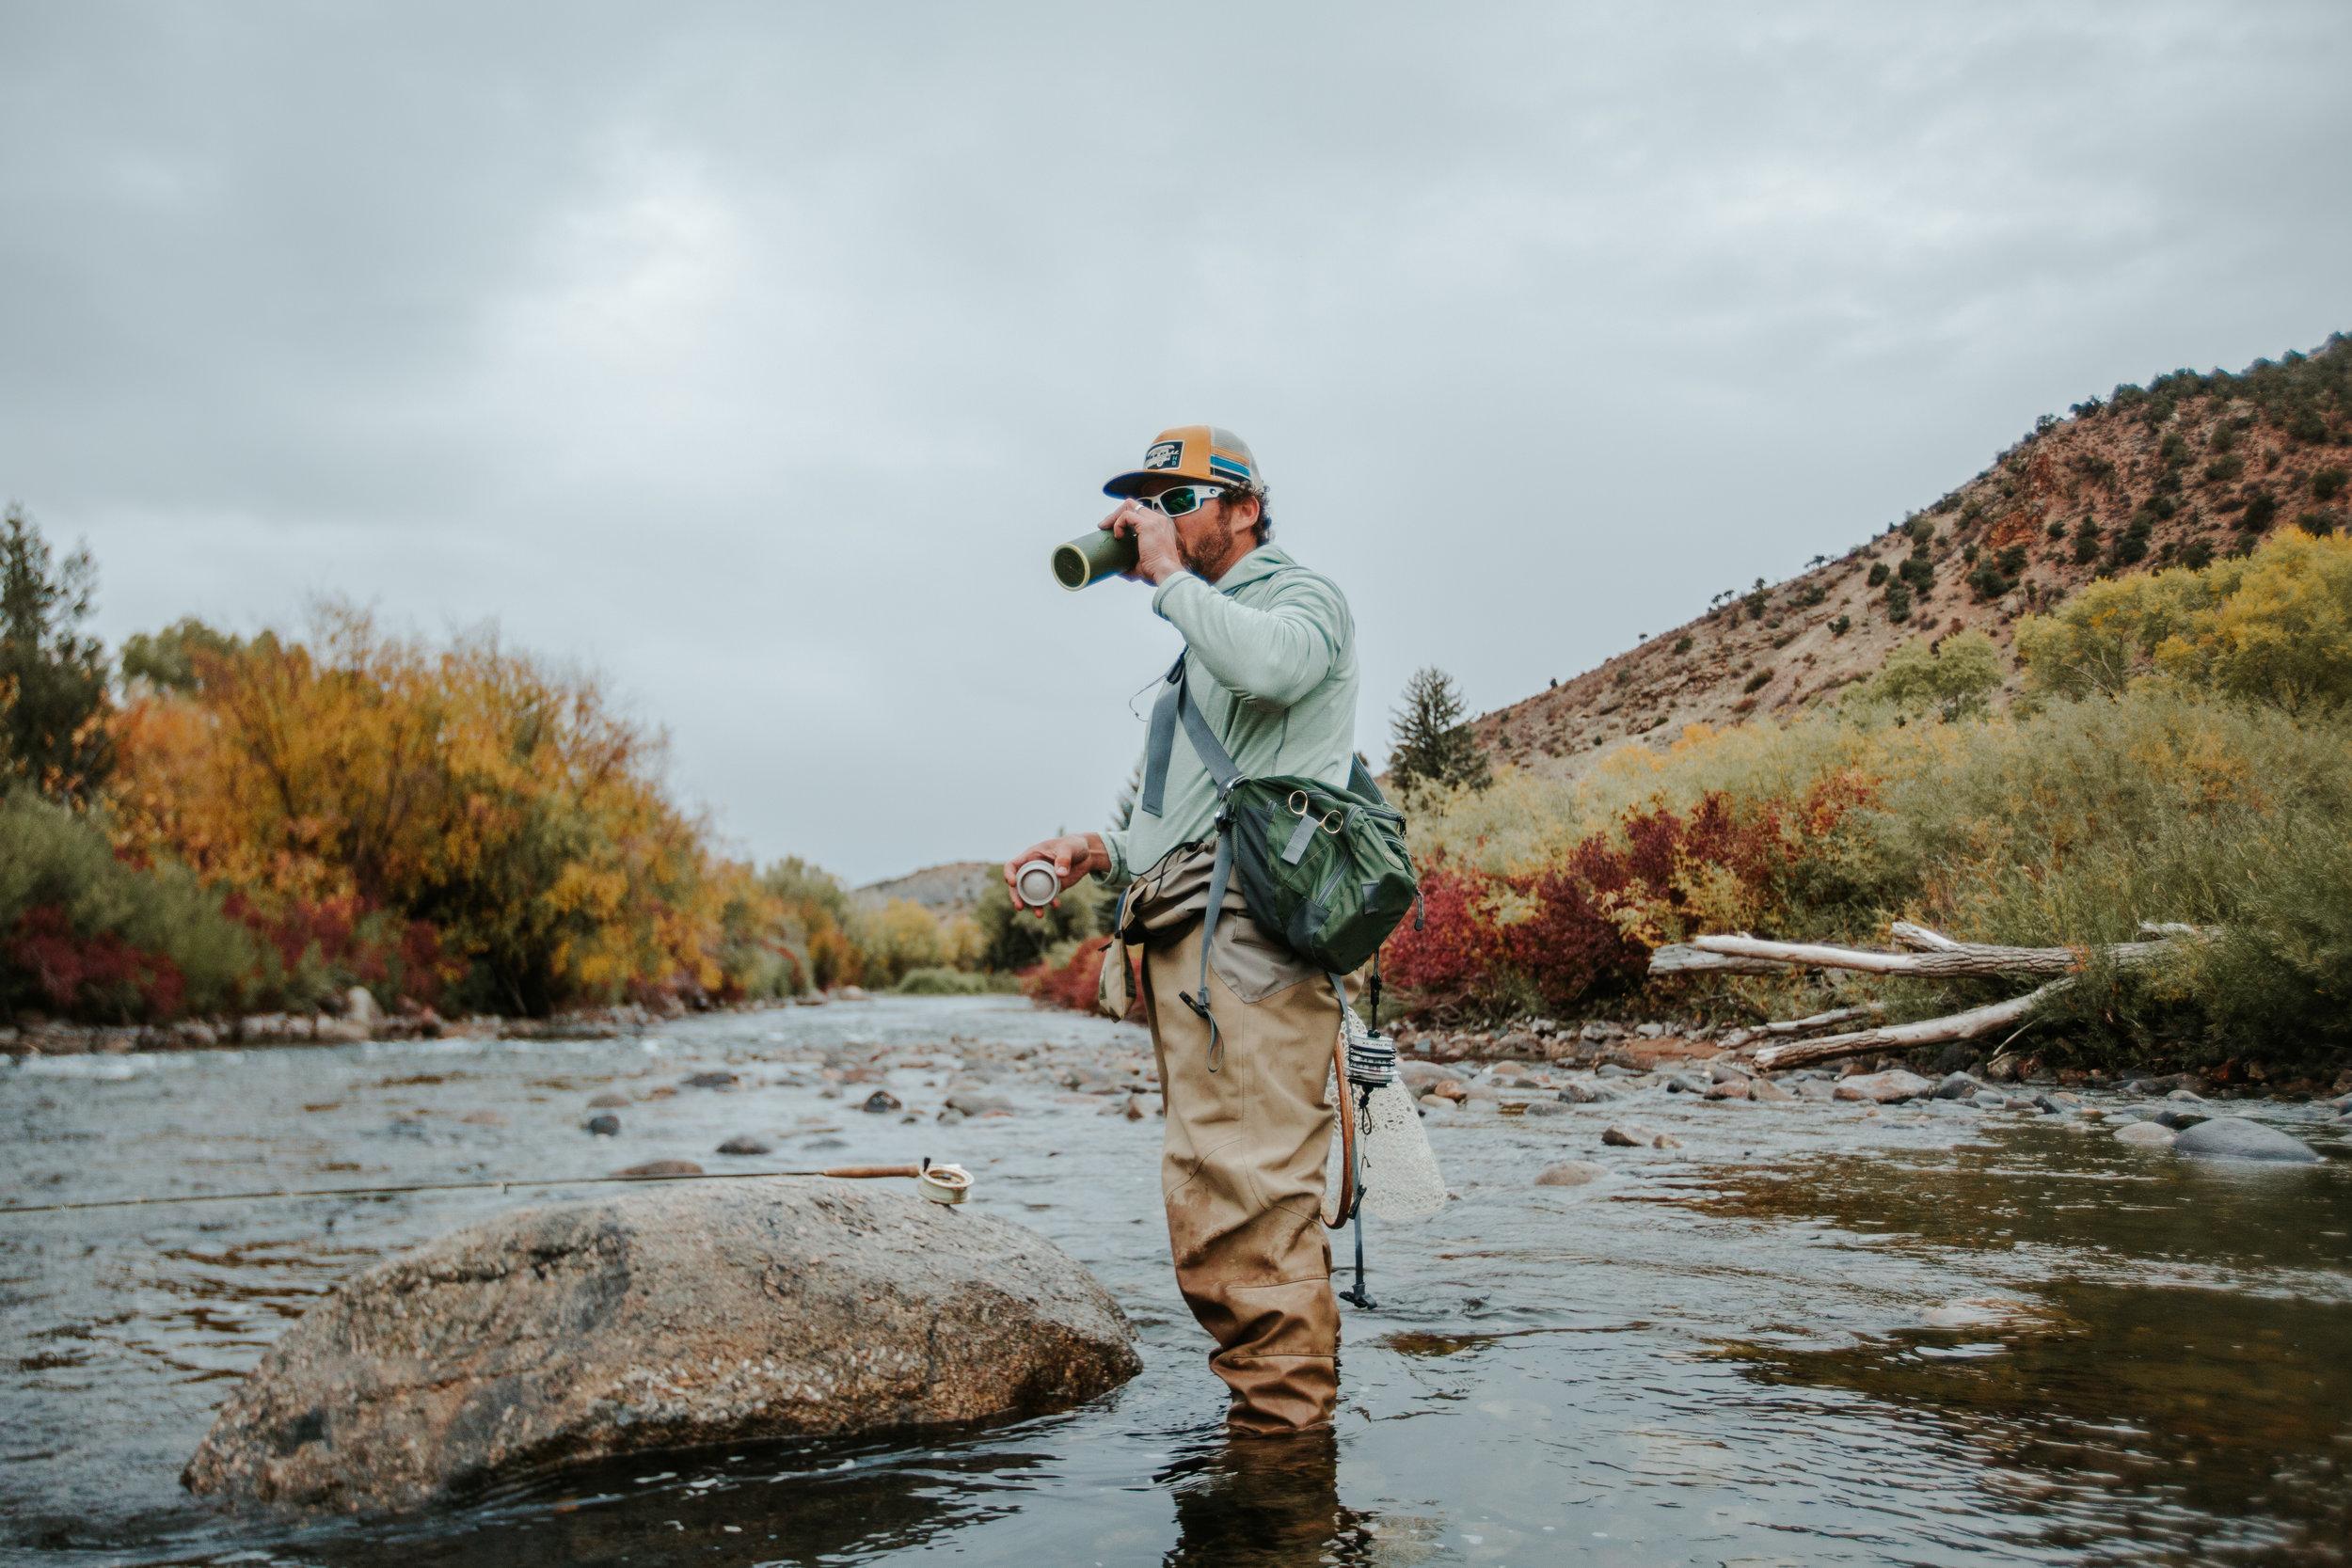 Fly Fishing_Kyle Murphy_@briskventure_015.JPG